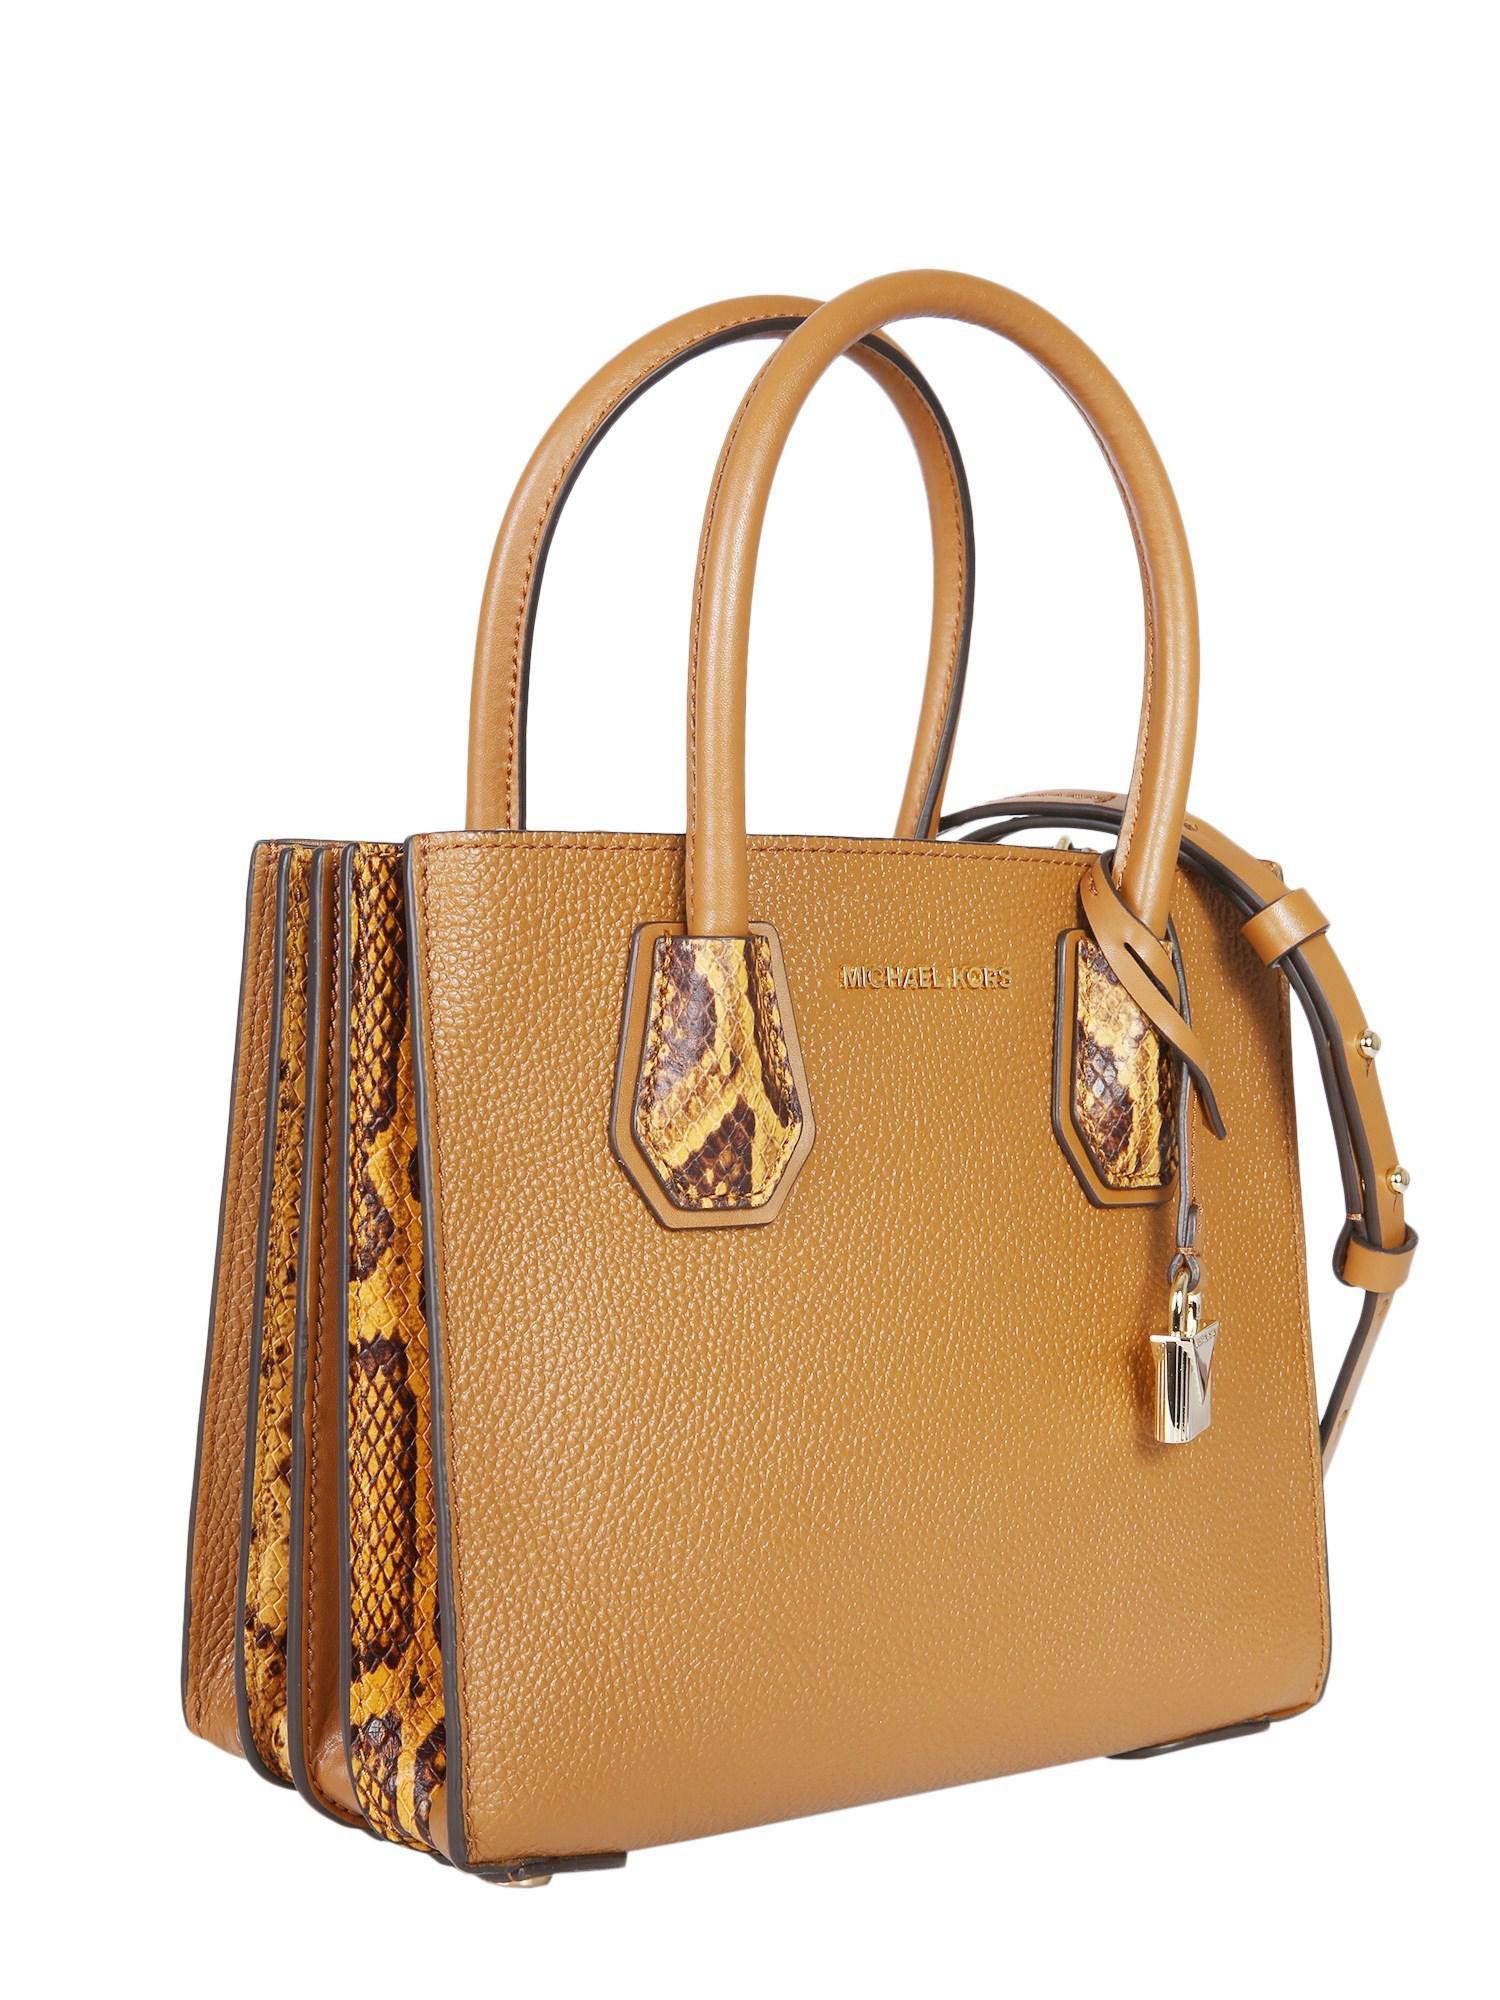 bd46f0004d92 MICHAEL Michael Kors - Brown Medium Mercer Leather Bag - Lyst. View  fullscreen